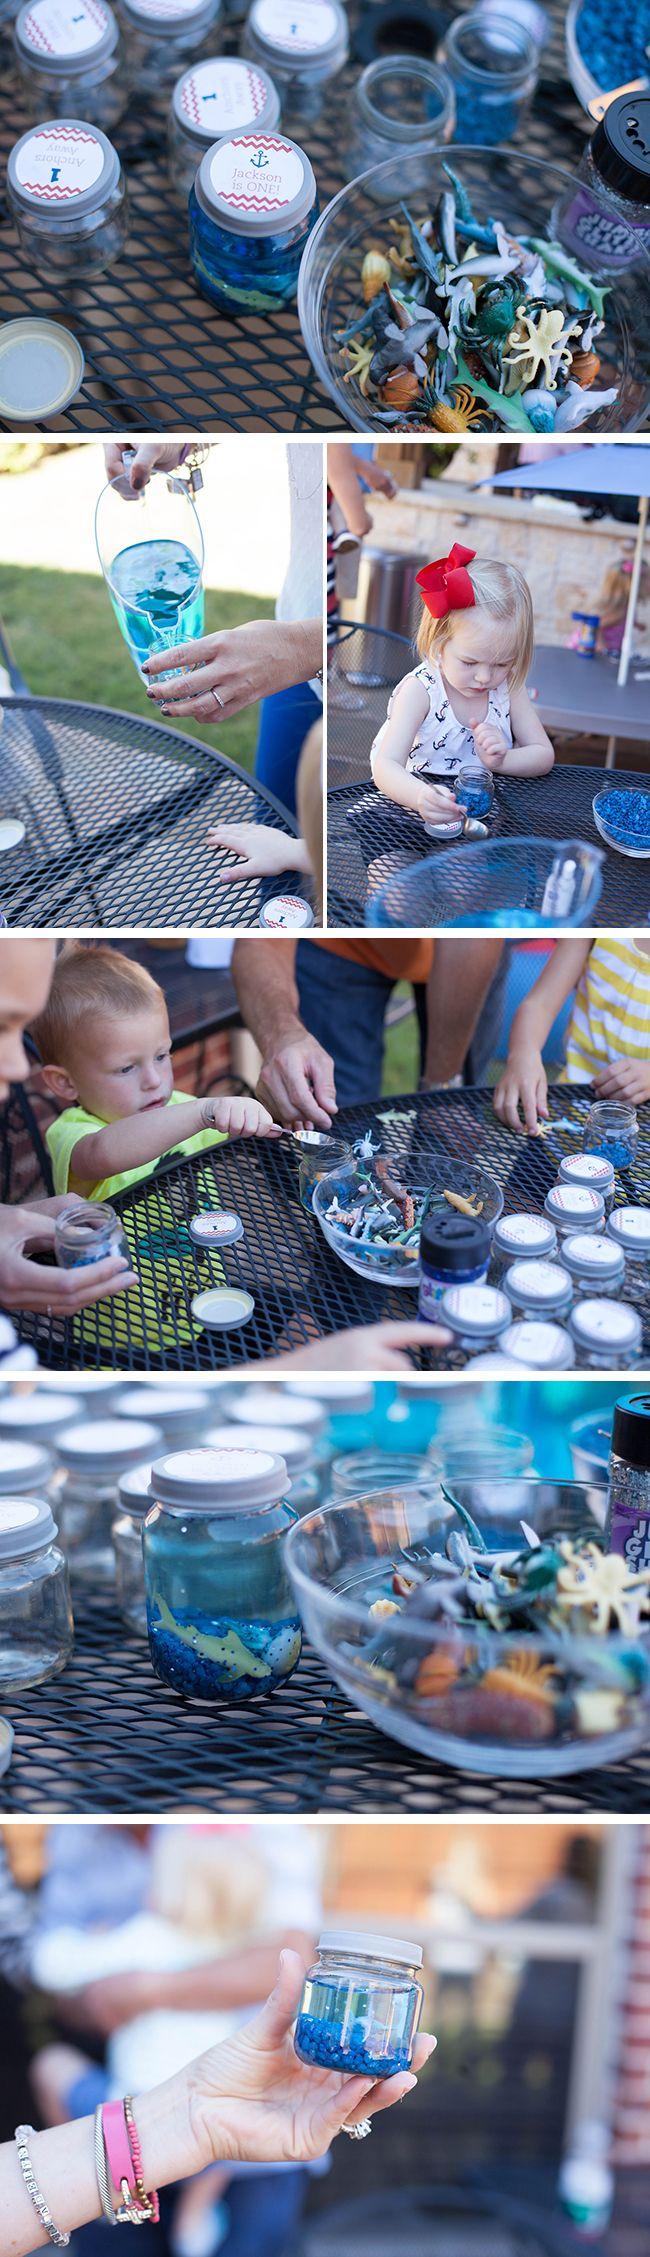 Nautical theme birthday party - DIY mini aquarium party favors                                                                                                                                                                                 More